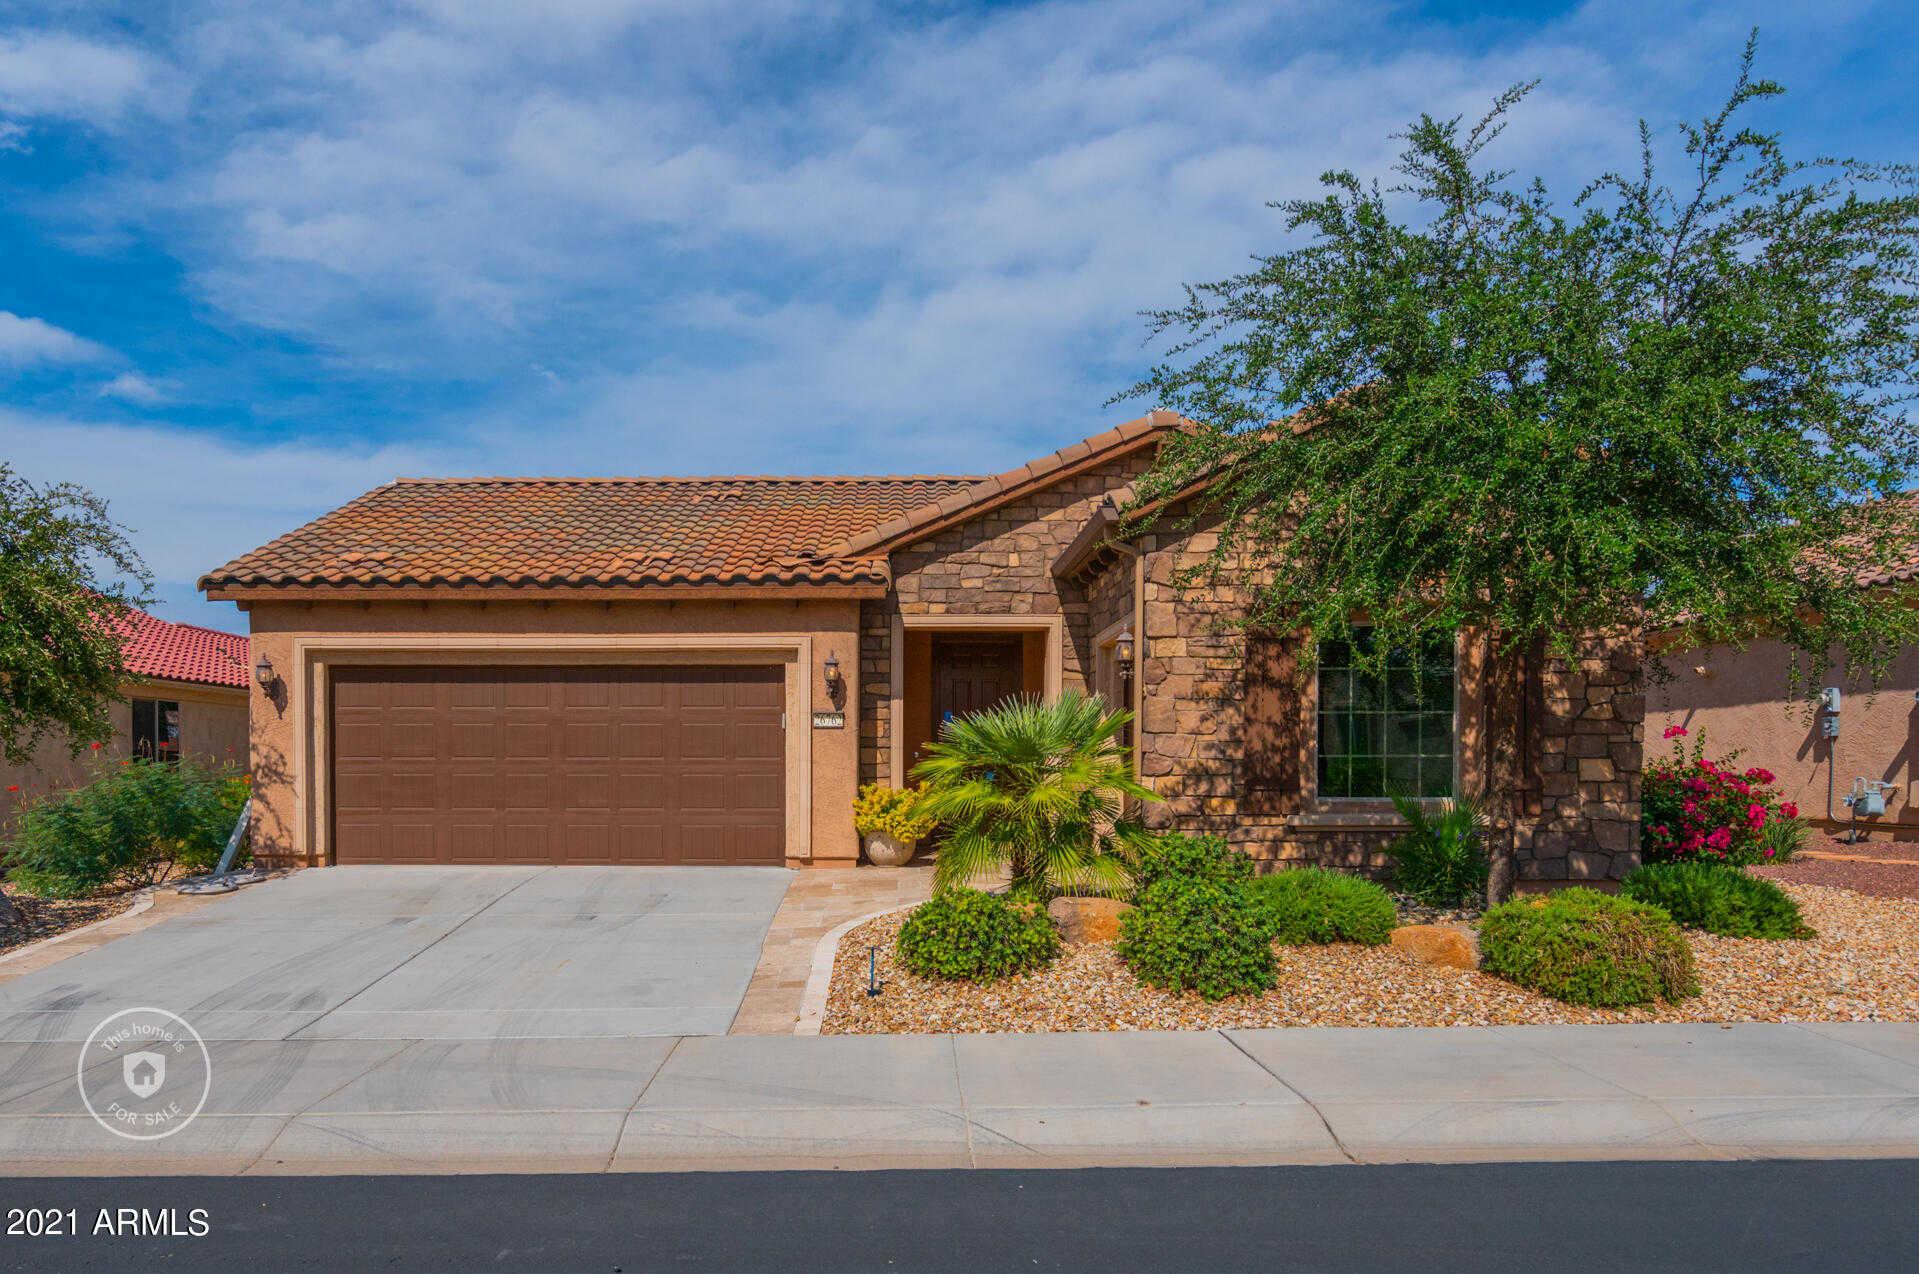 $490,000 - 2Br/2Ba - Home for Sale in Sun City Festival Parcel O1 Phase 2, Buckeye